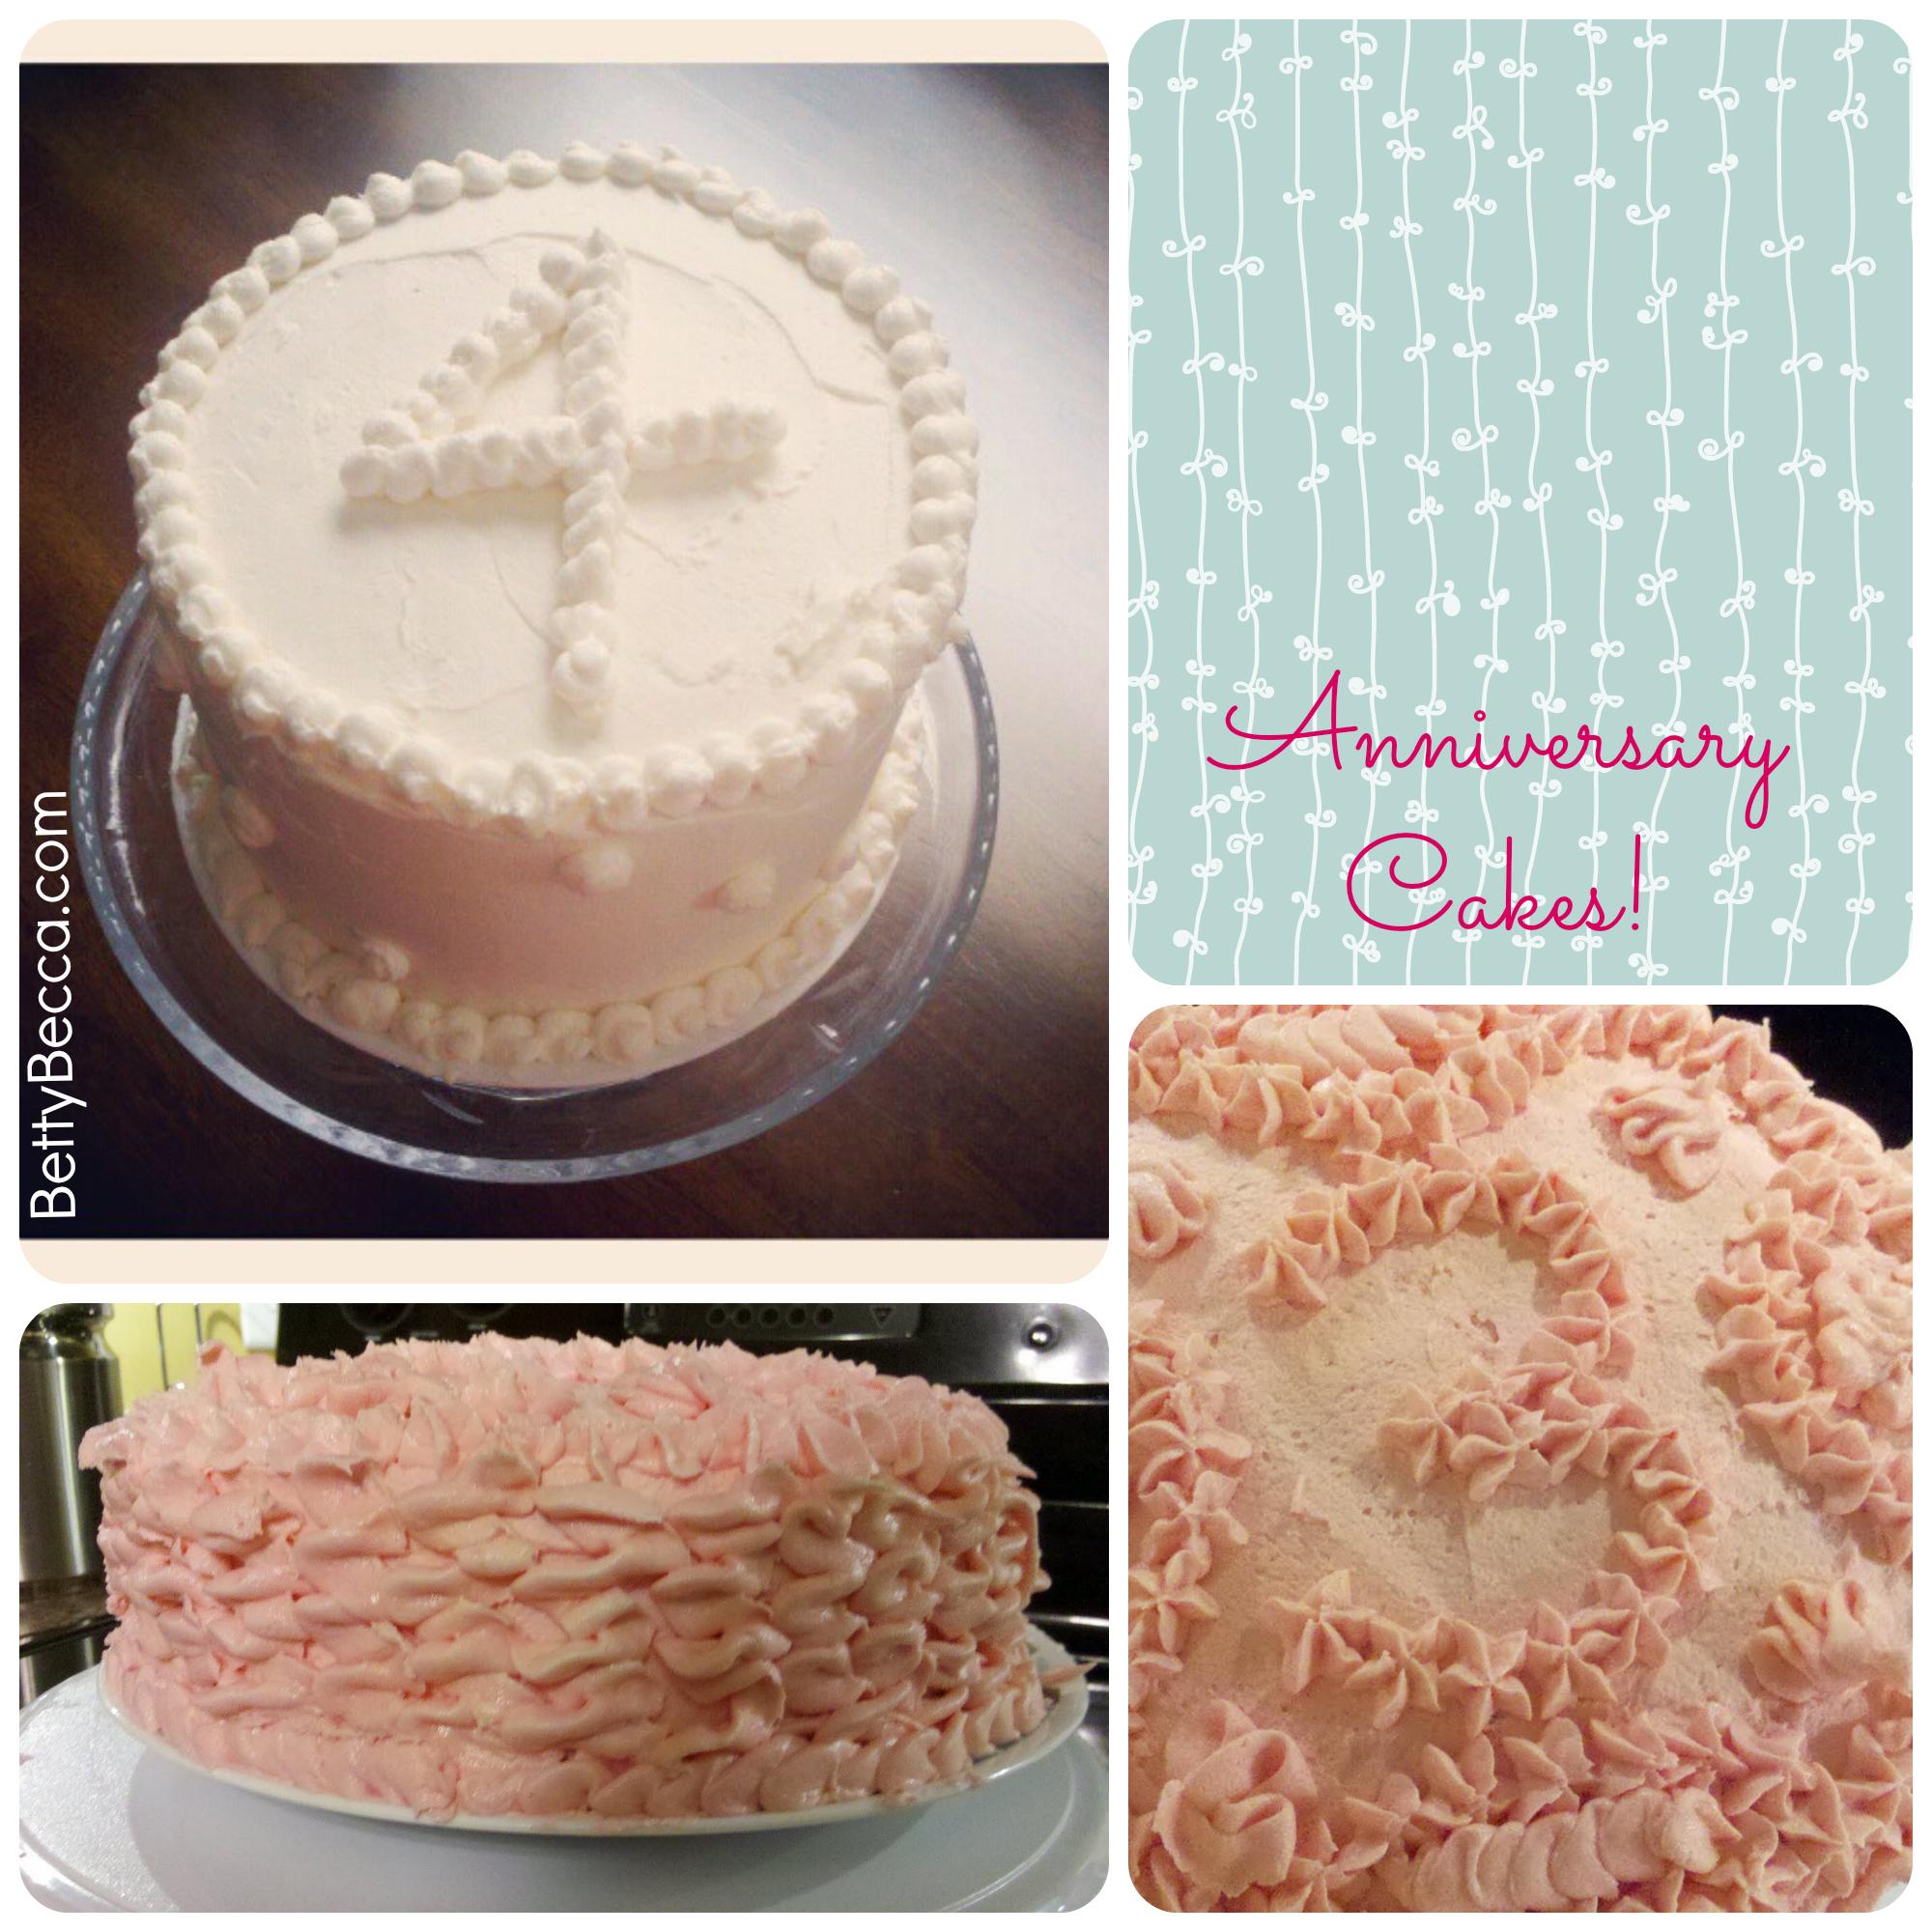 anniversary_cakes_text.jpg